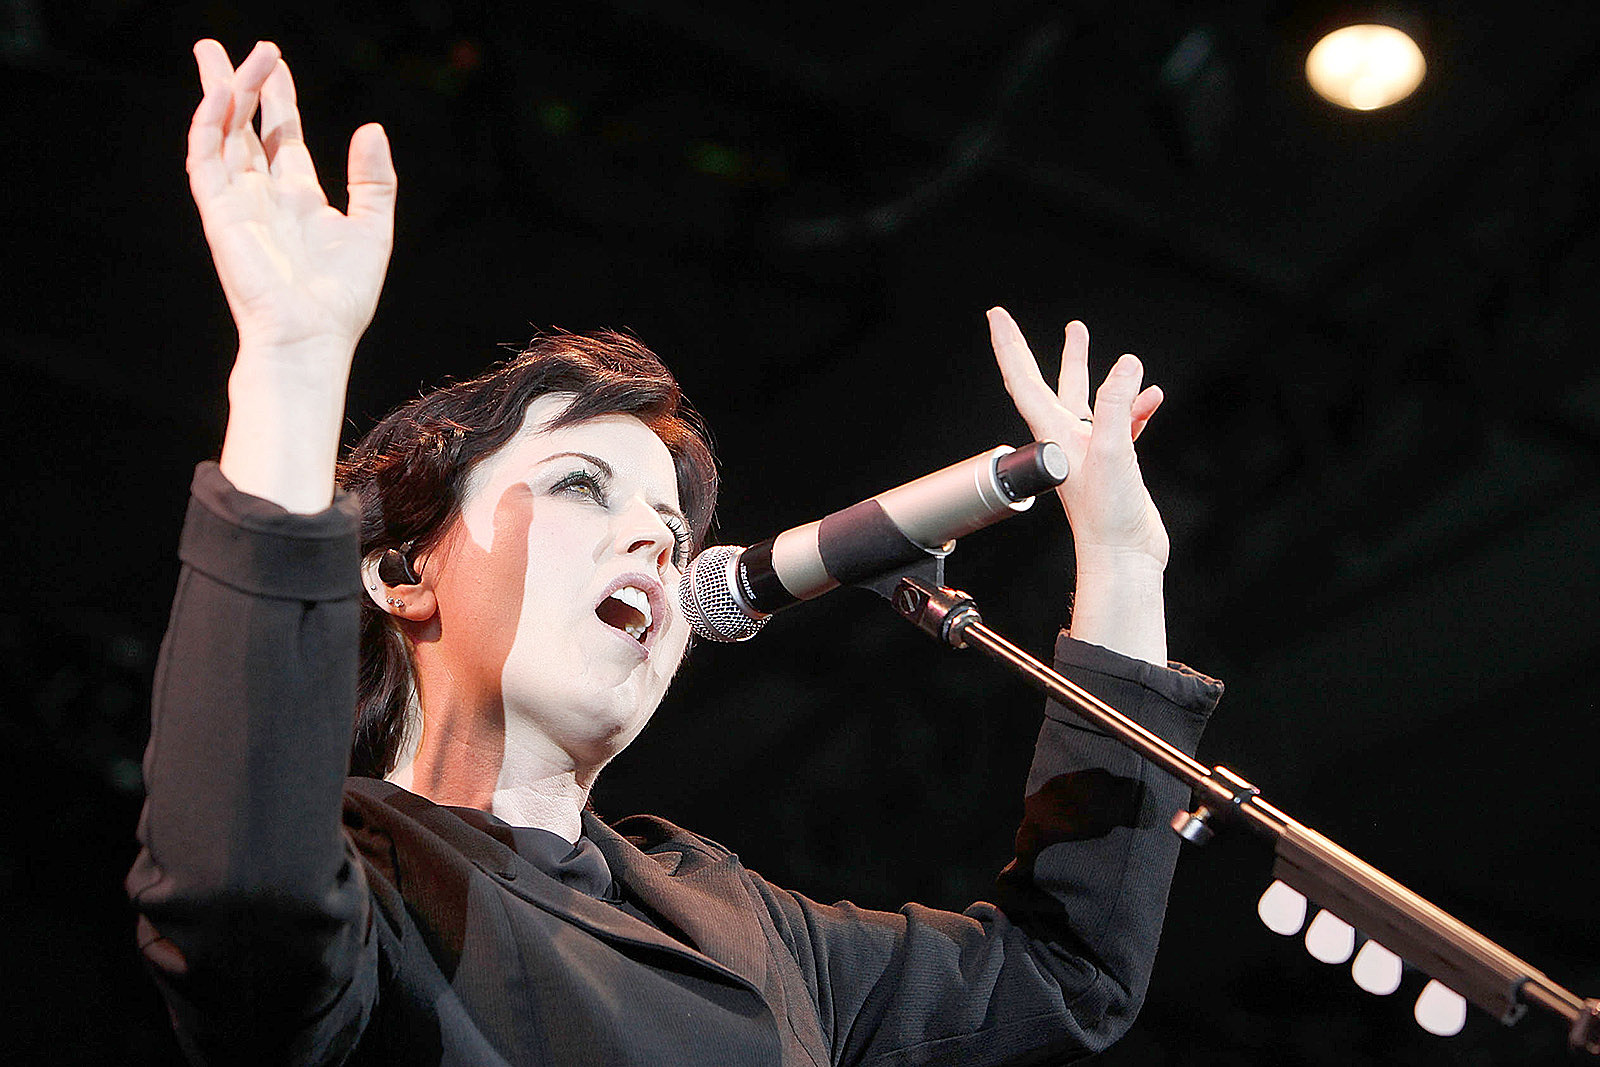 Cranberries to Split After Last Album Featuring Dolores O'Riordan